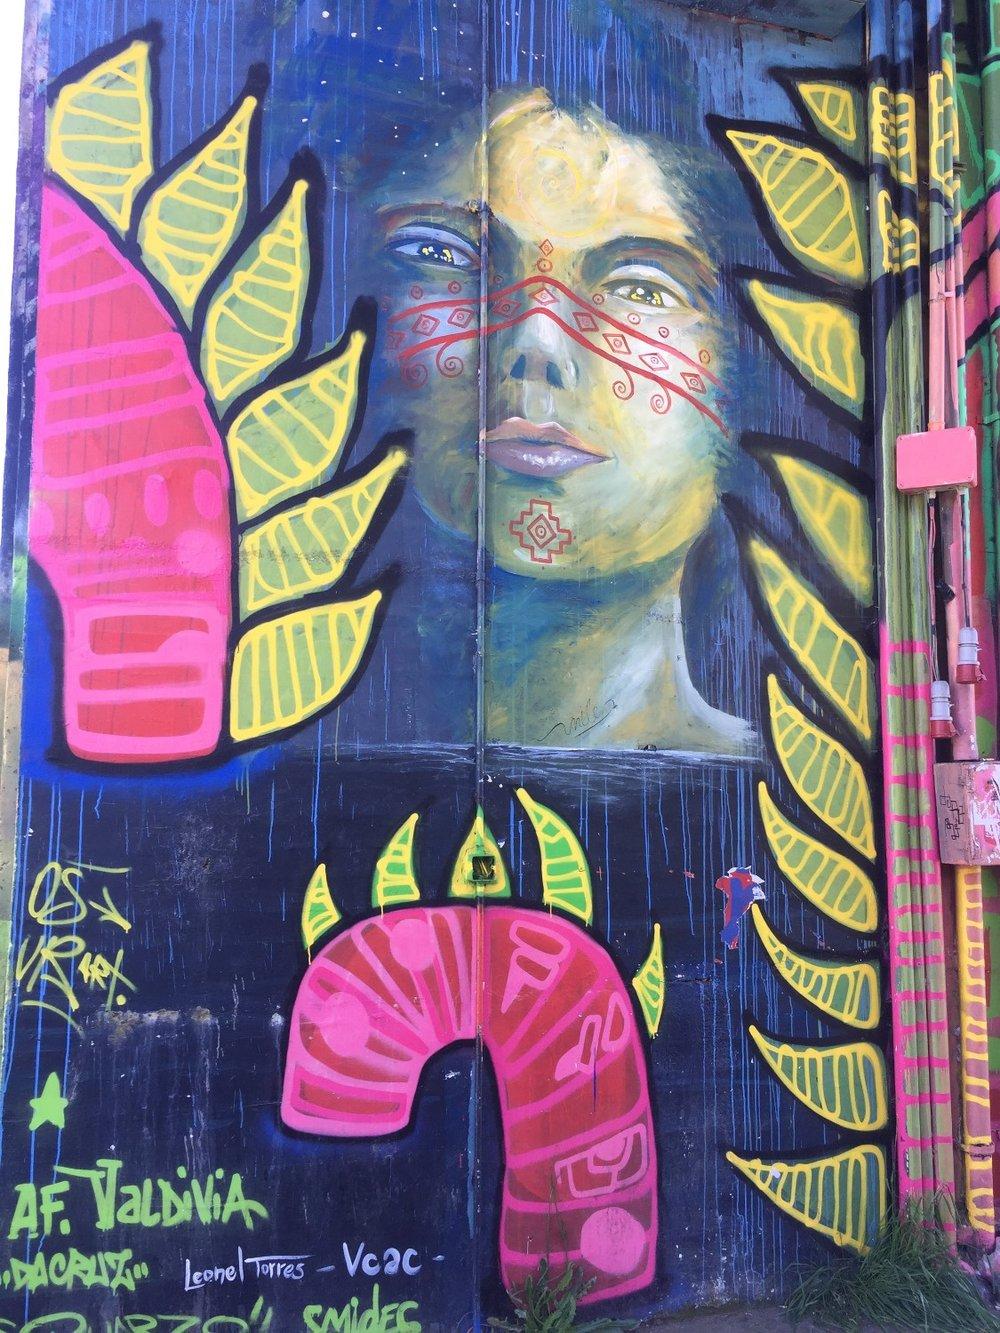 Street art Valdivia, Chile